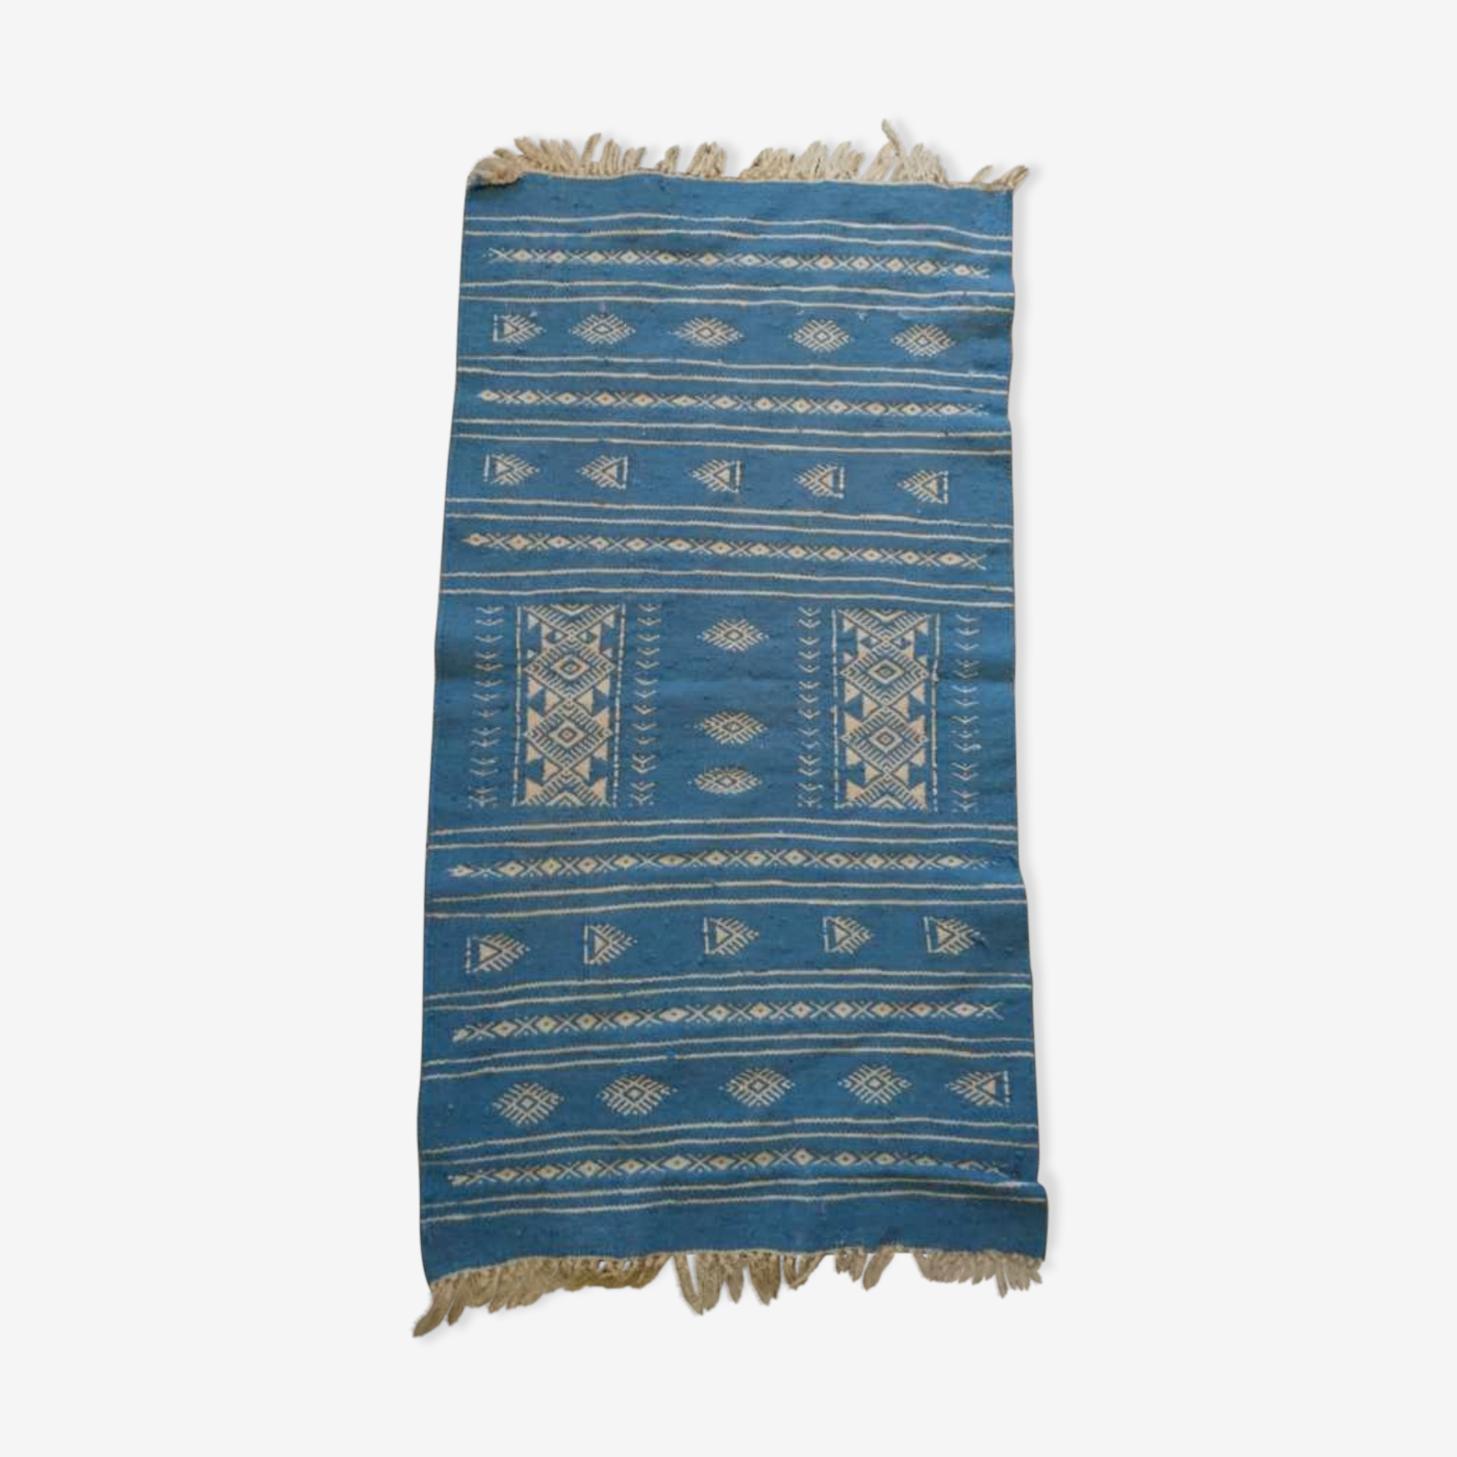 Tapis berbère bleu et blanc 118 x 65 cm